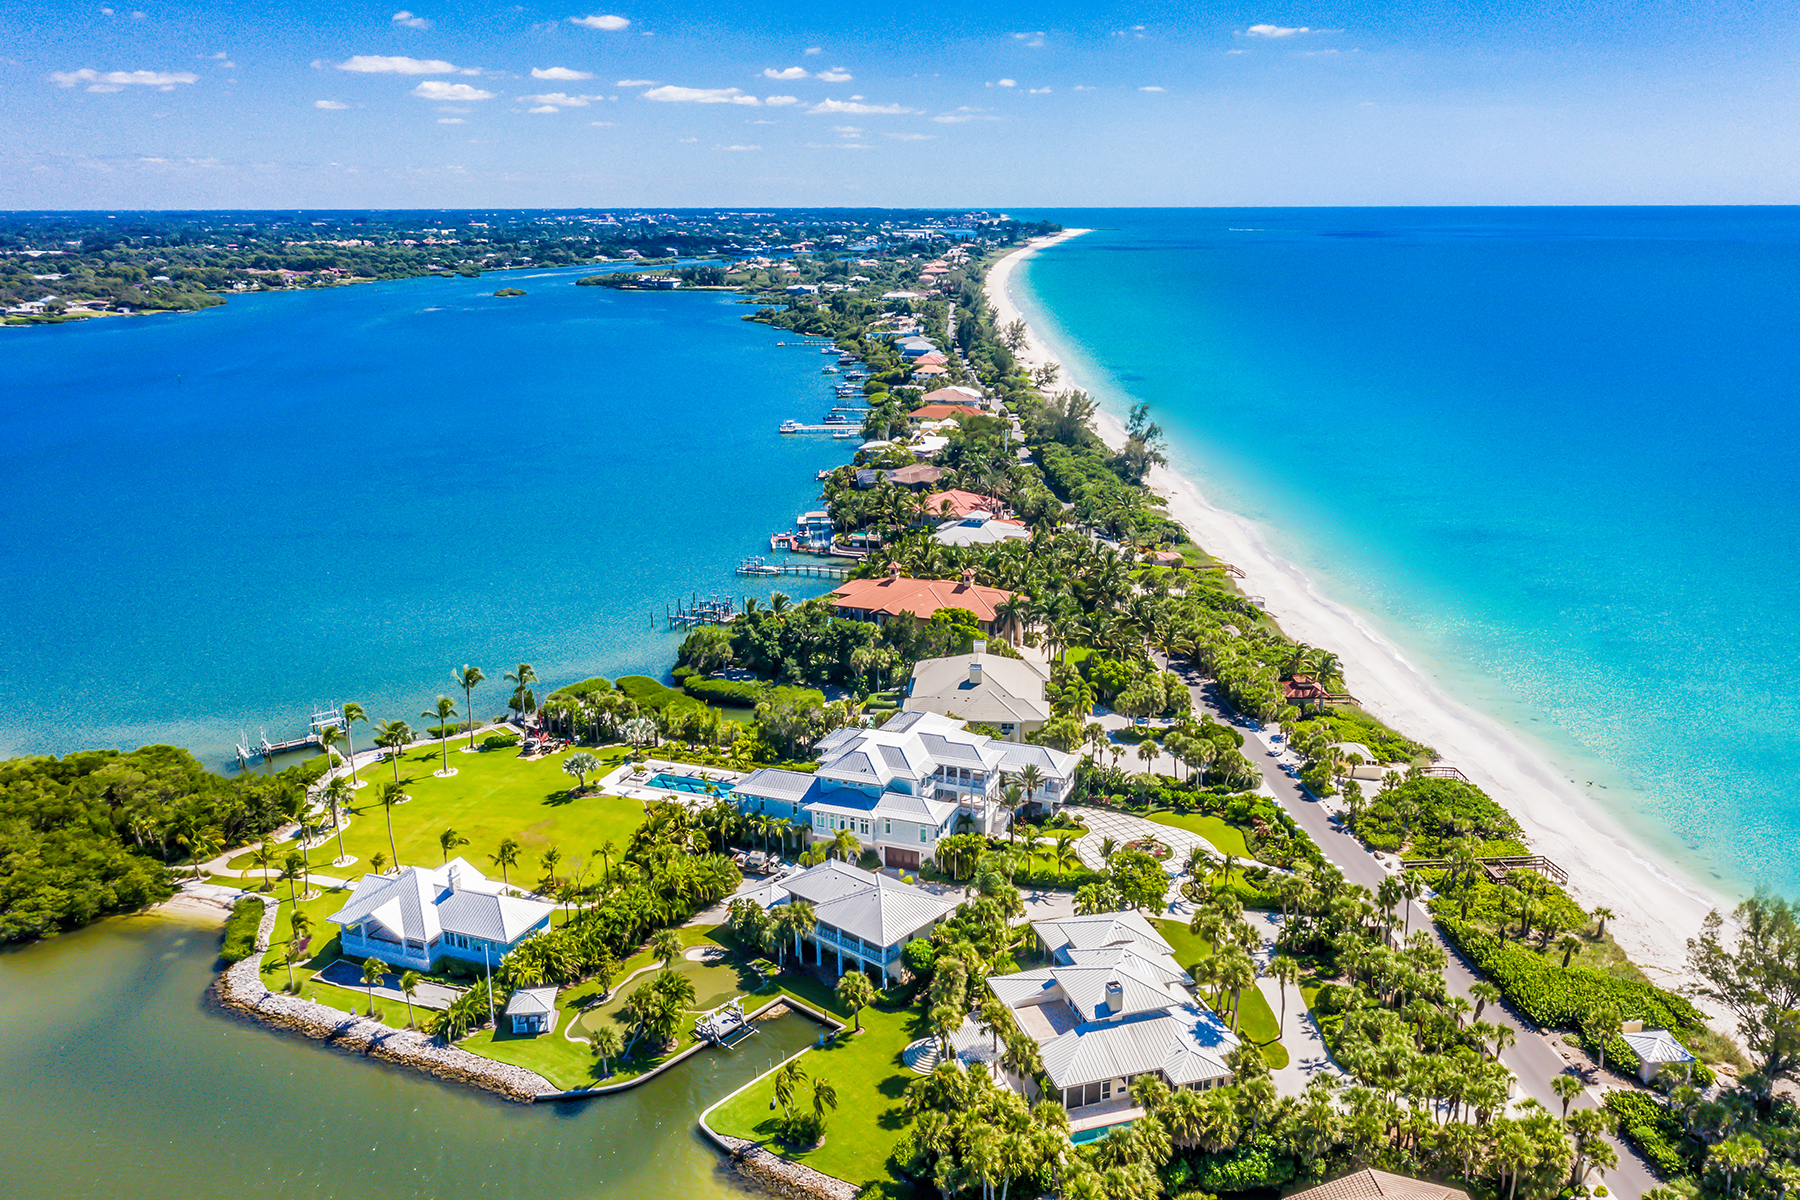 Single Family Homes for Sale at 1906 Casey Key Rd, Nokomis, Florida 34275 United States